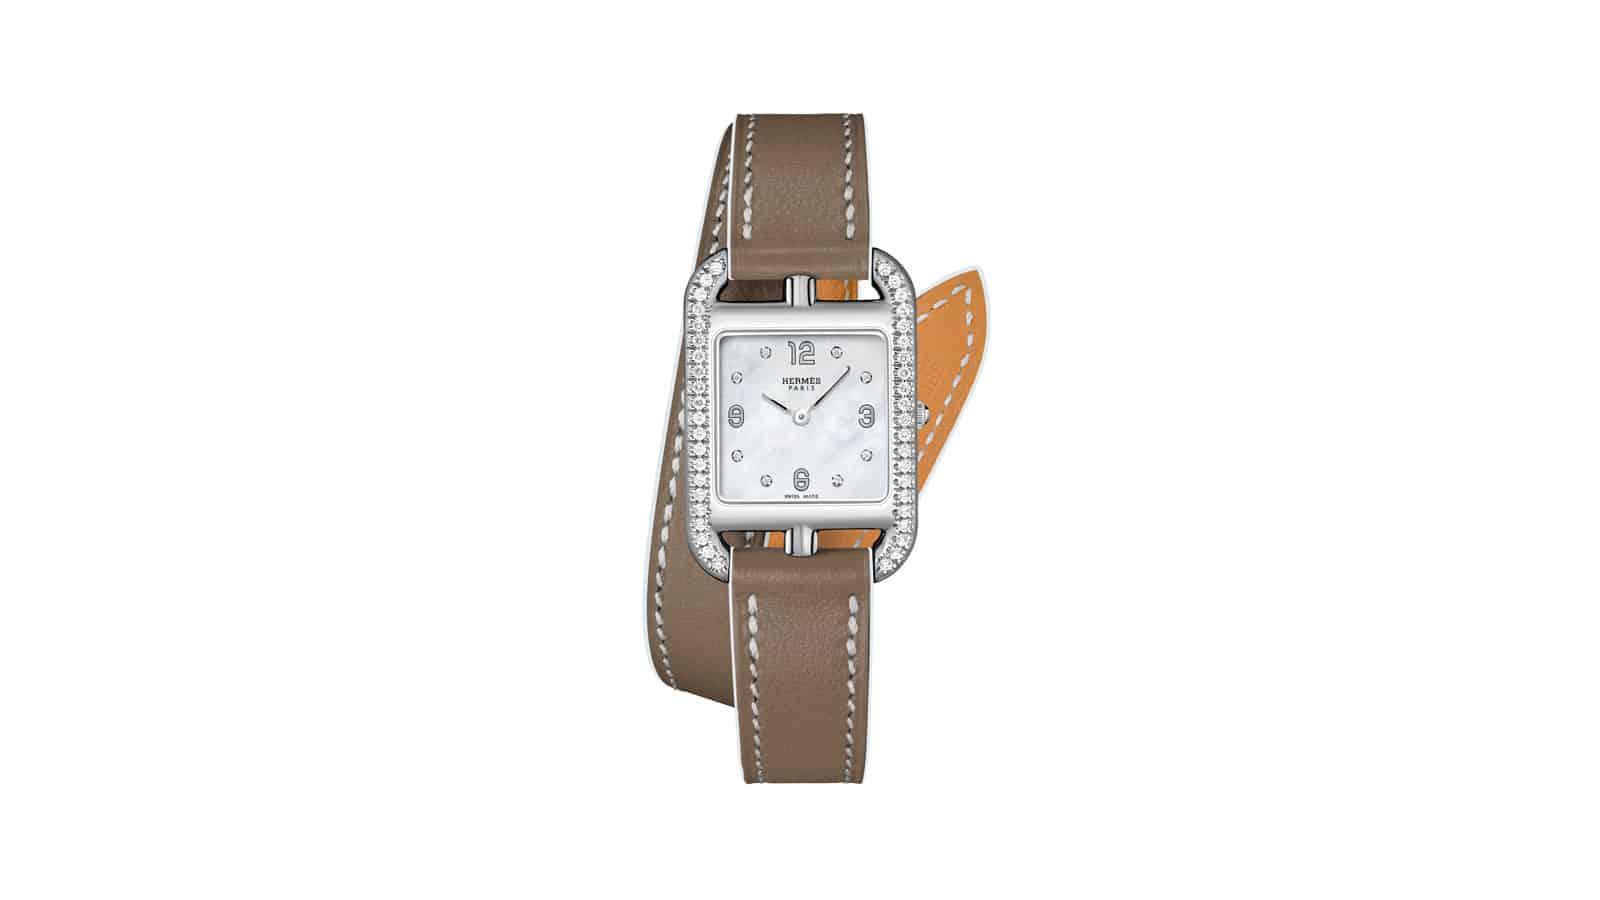 Hermes-Cape-Cod-Lionel-Meylan-horlogerie-joaillerie-vevey